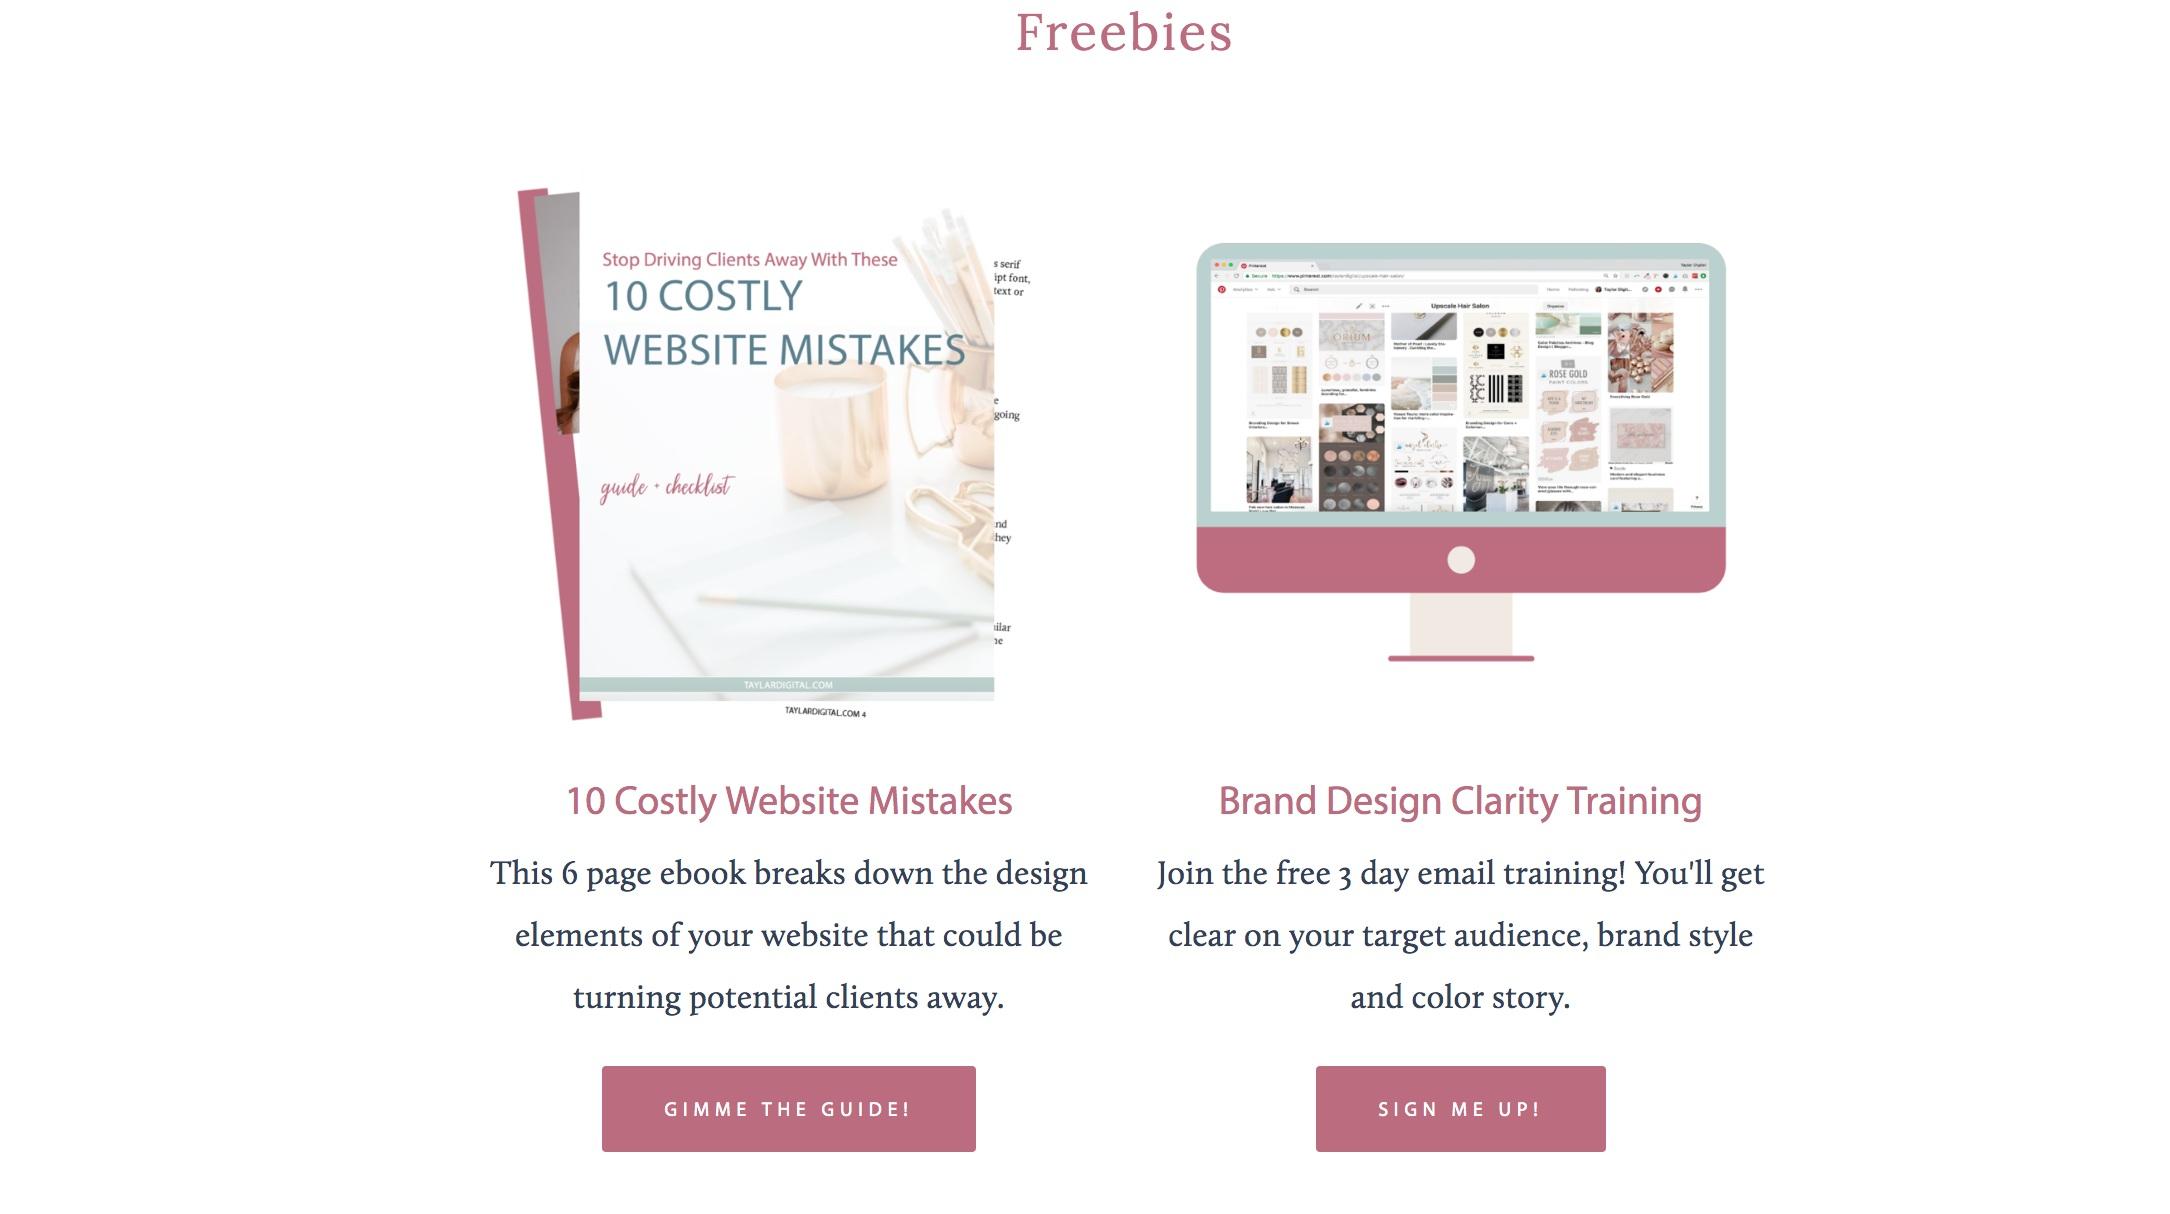 Shop+freebies+page.jpg